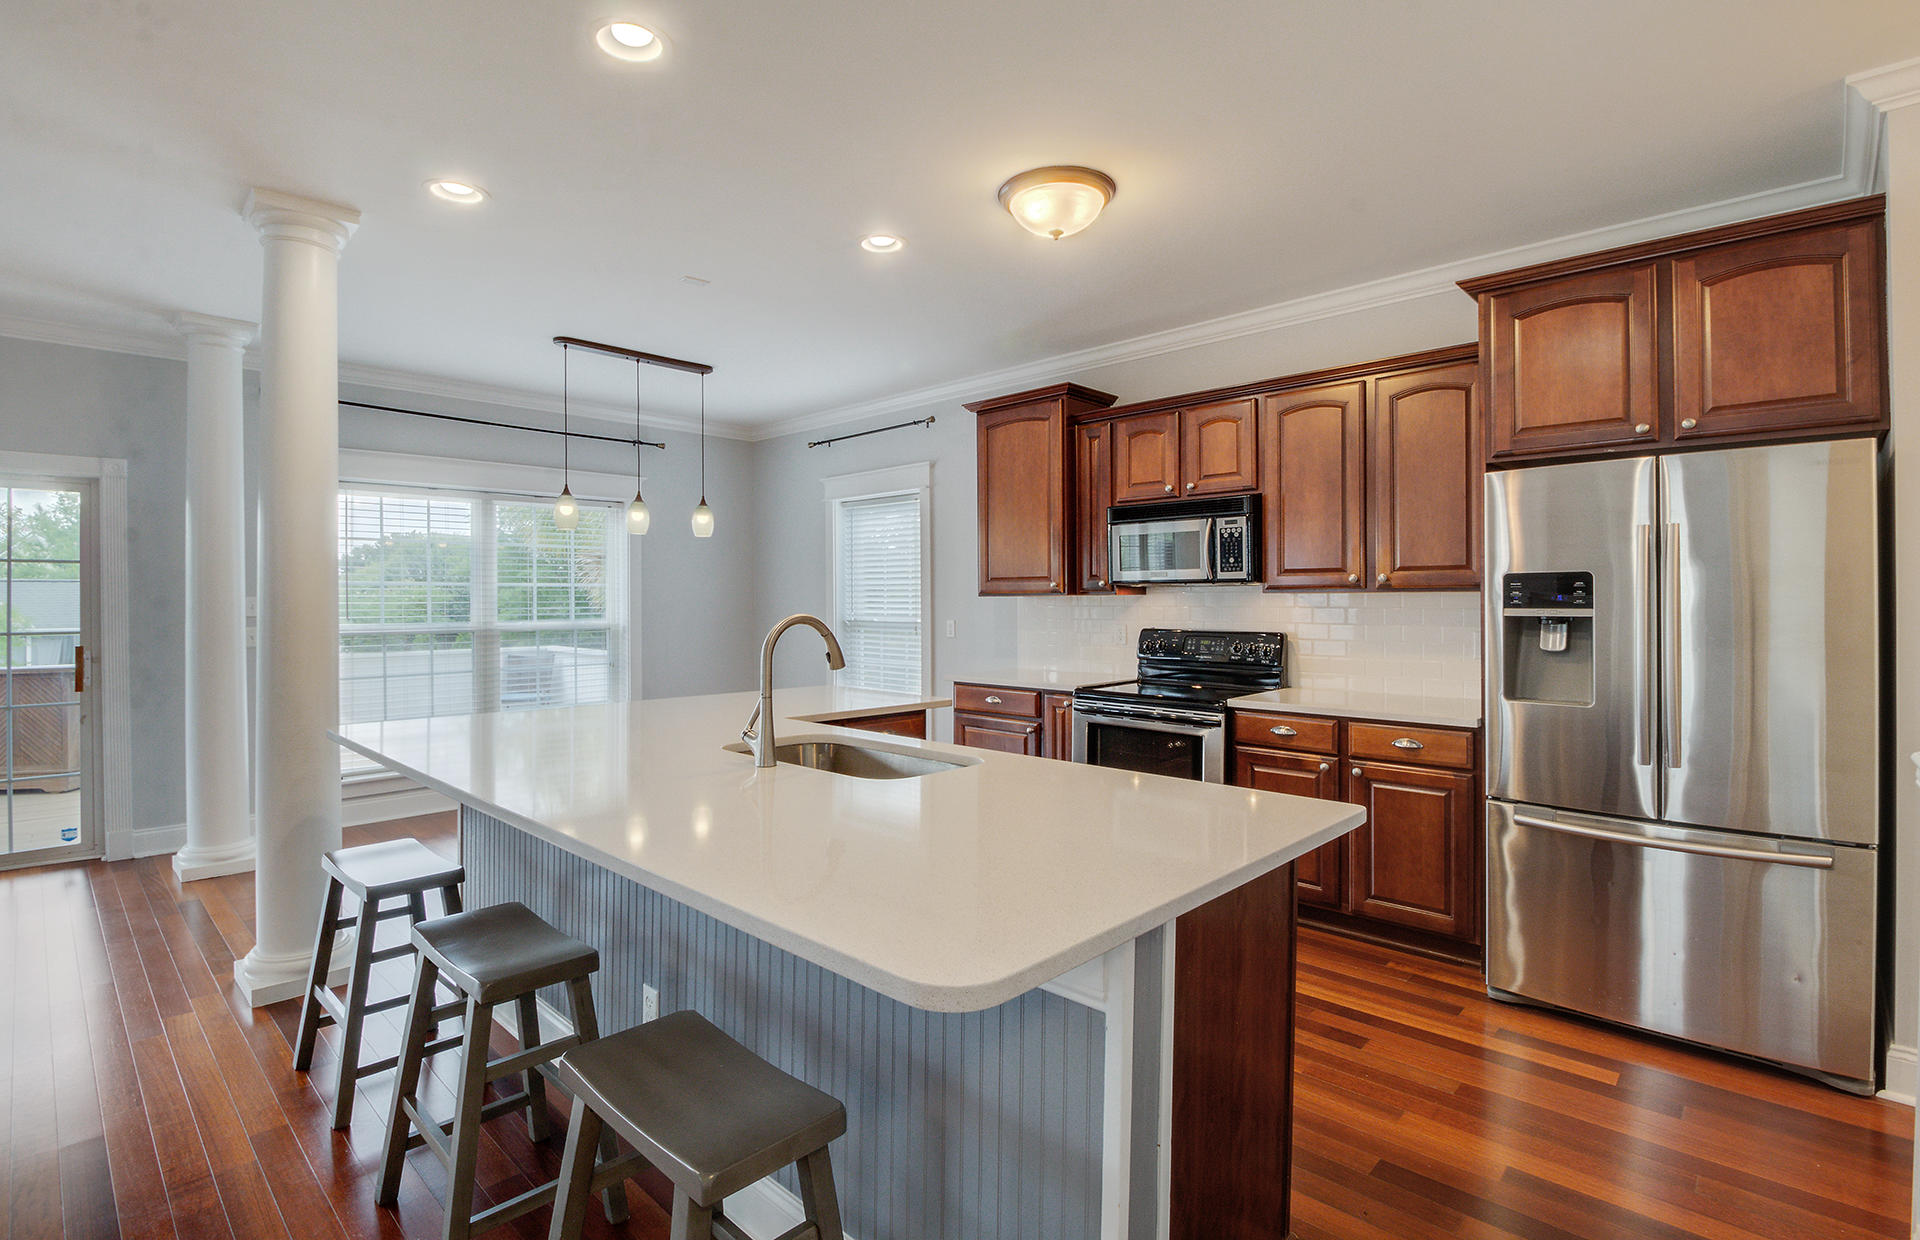 Daniel Island Homes For Sale - 306 Ladd, Charleston, SC - 12